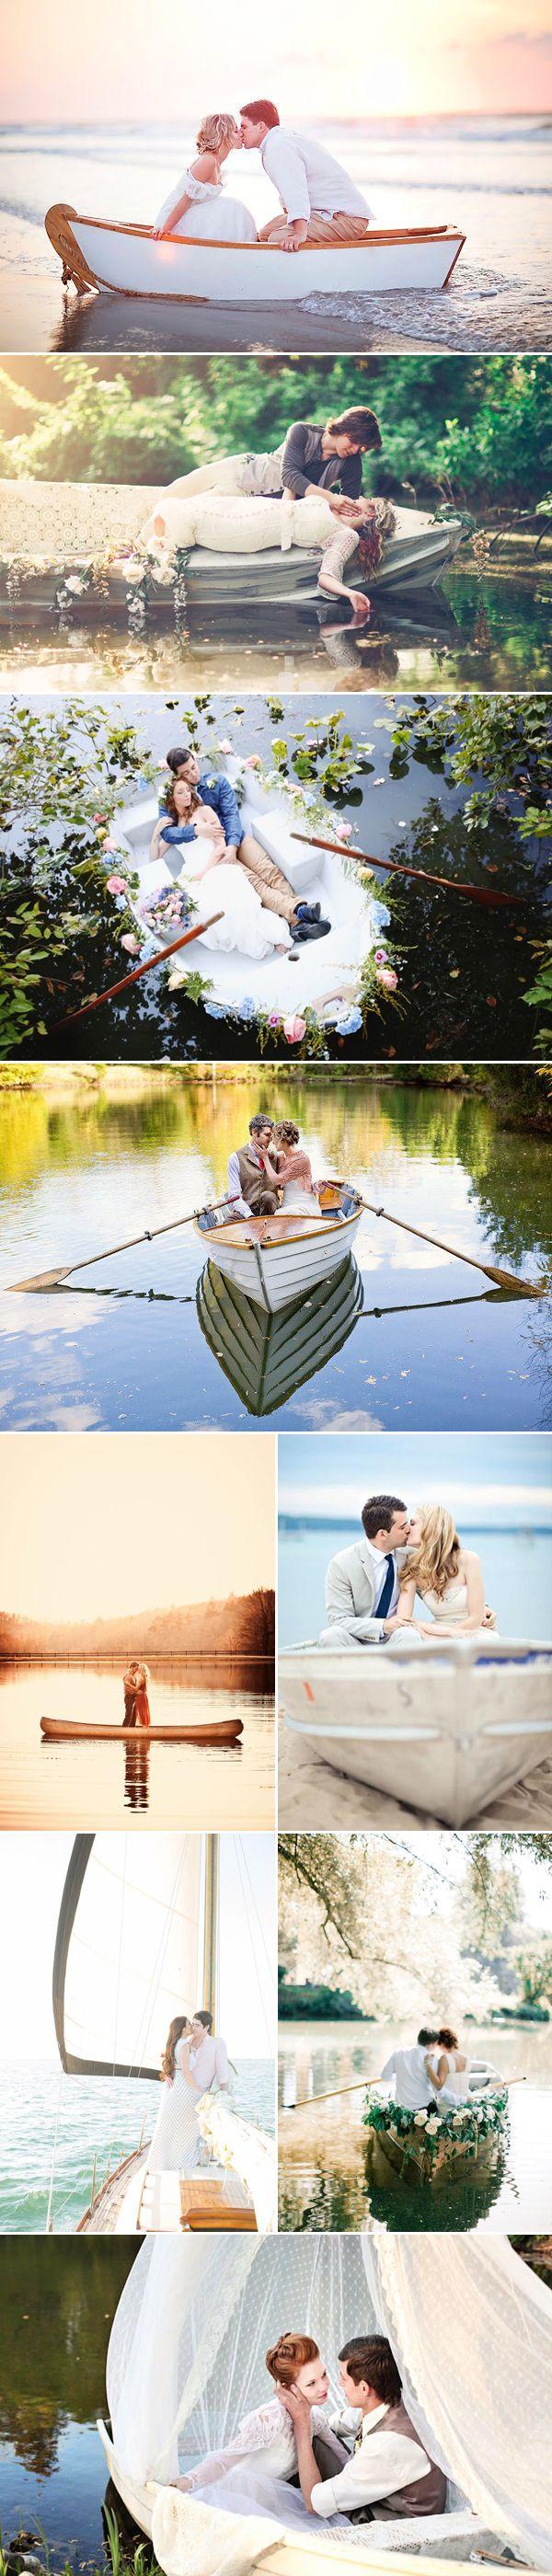 Romantic Love-Boat Engagement Photo Ideas – Praise Wedding